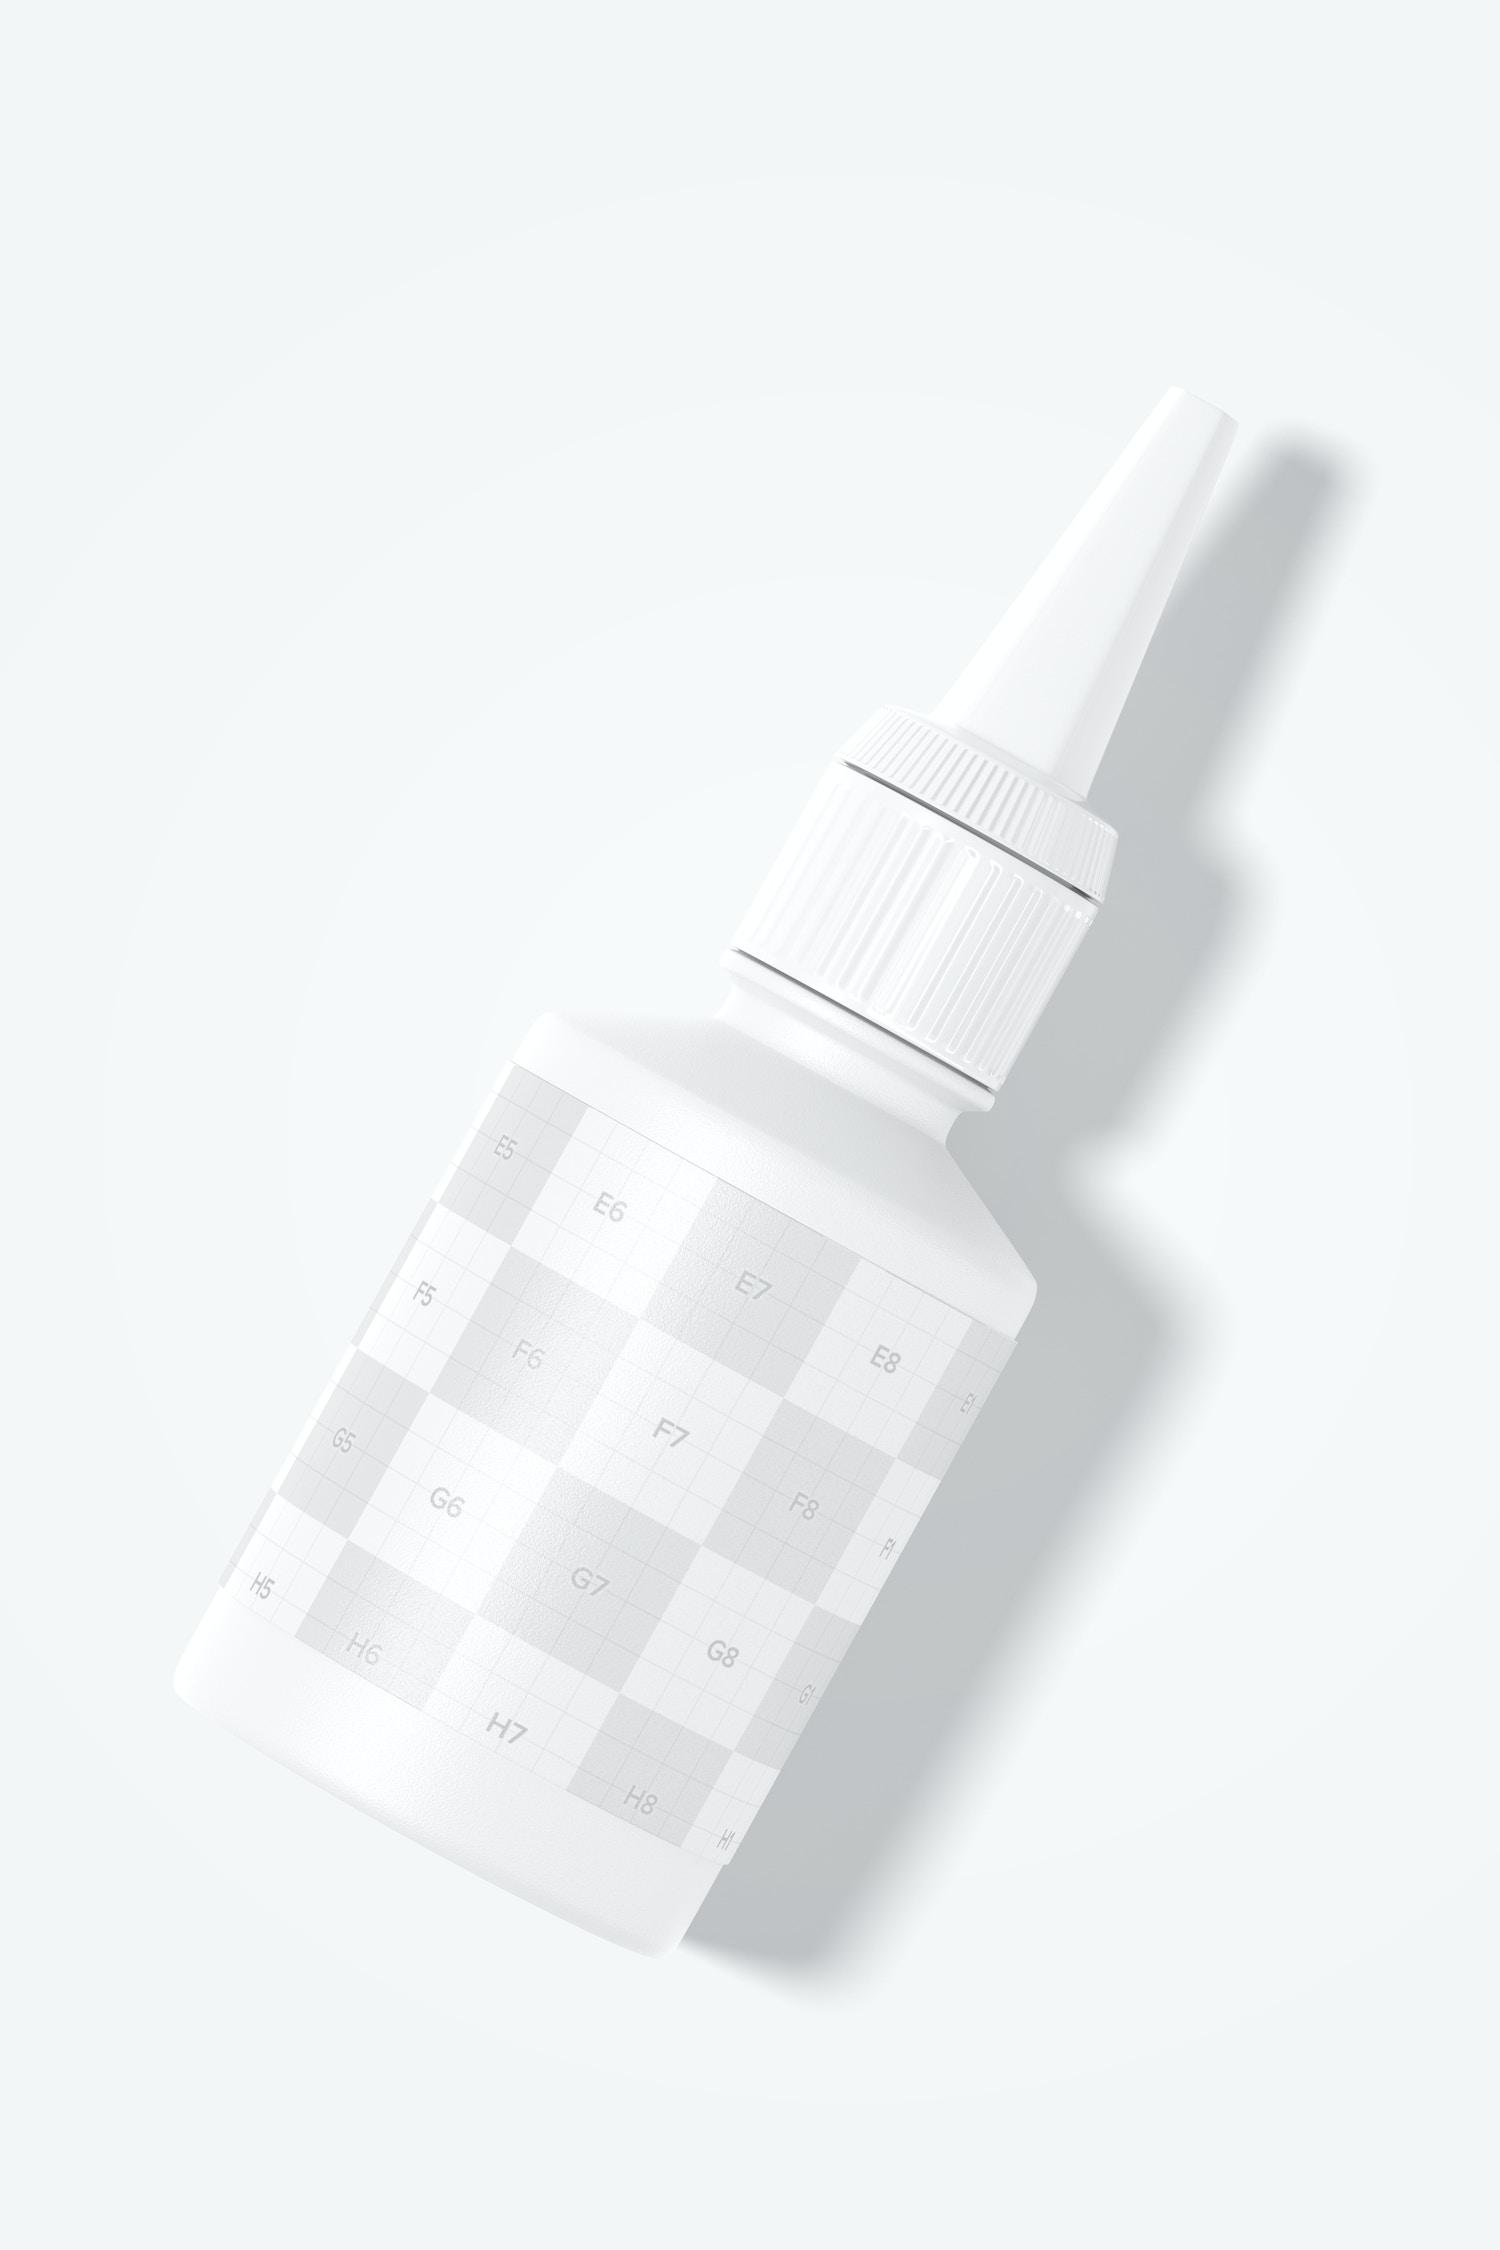 Super Glue Bottle Mockup, Top View